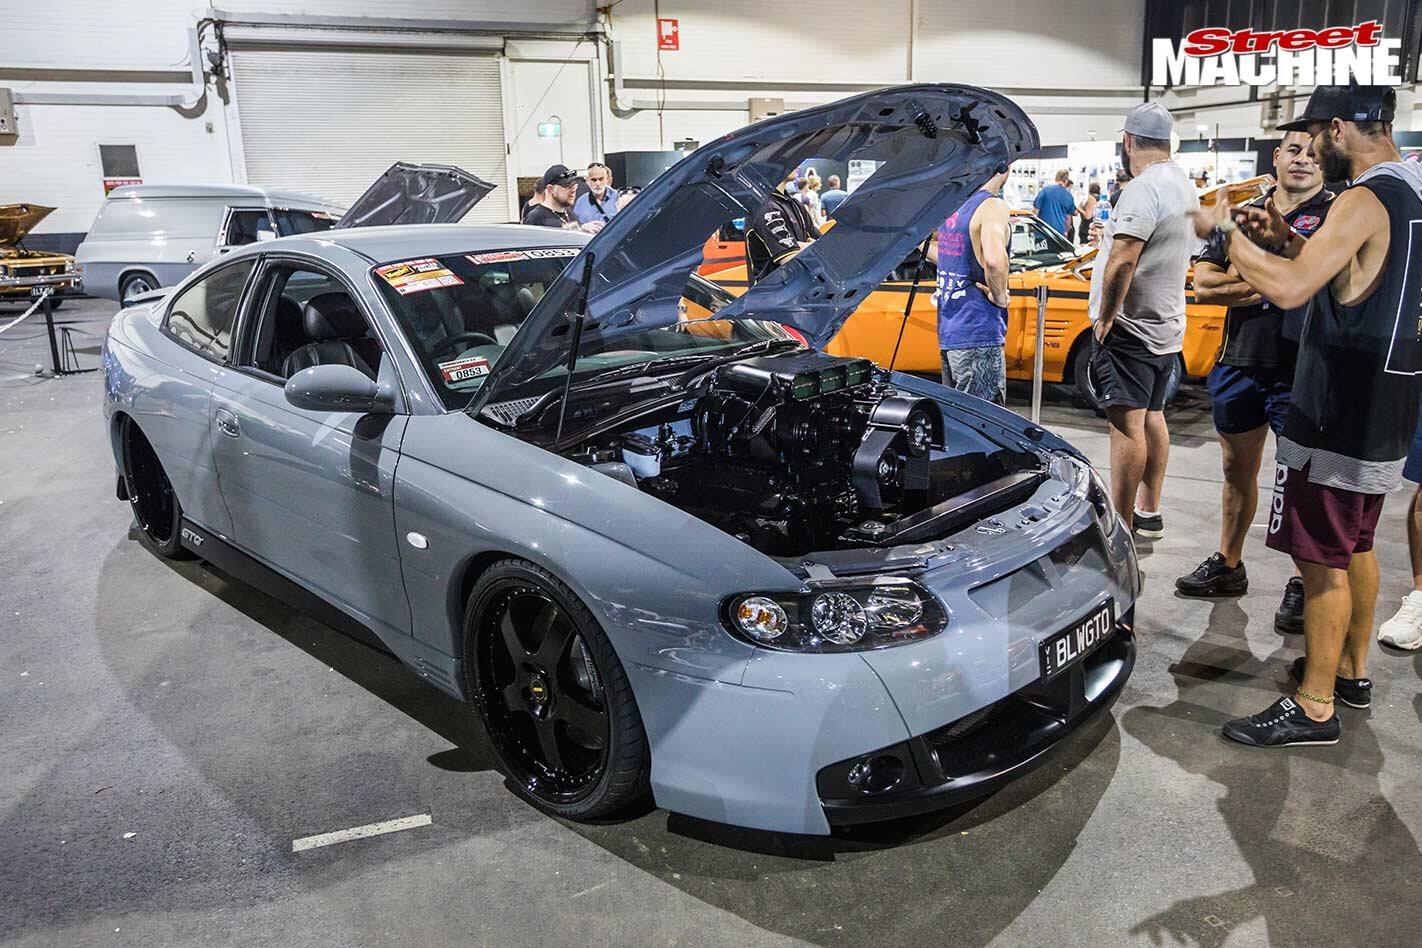 HSV GTO